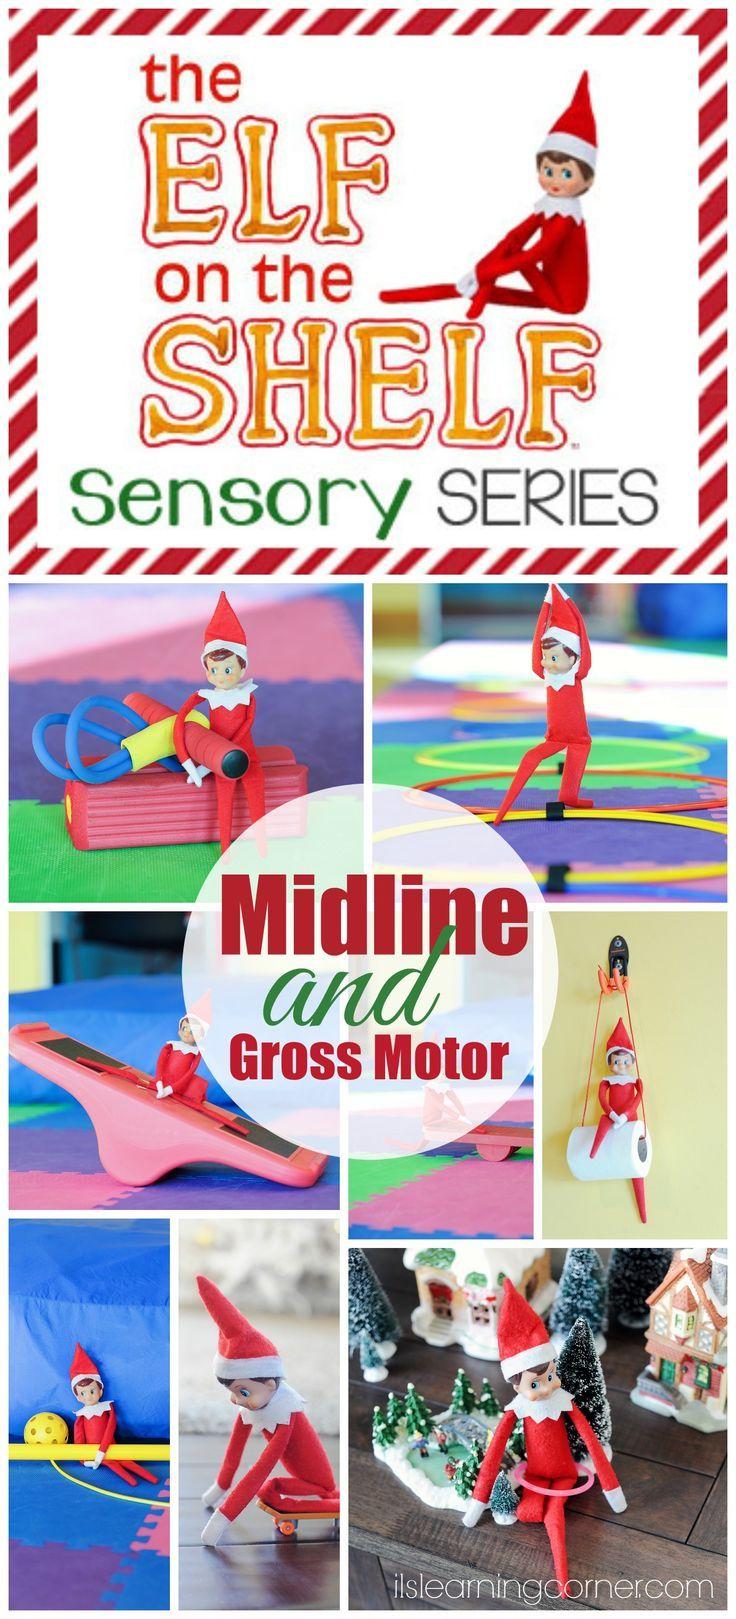 13 Gross Motor and Midline Elf on the Shelf Activities | ilslearningcorner.com